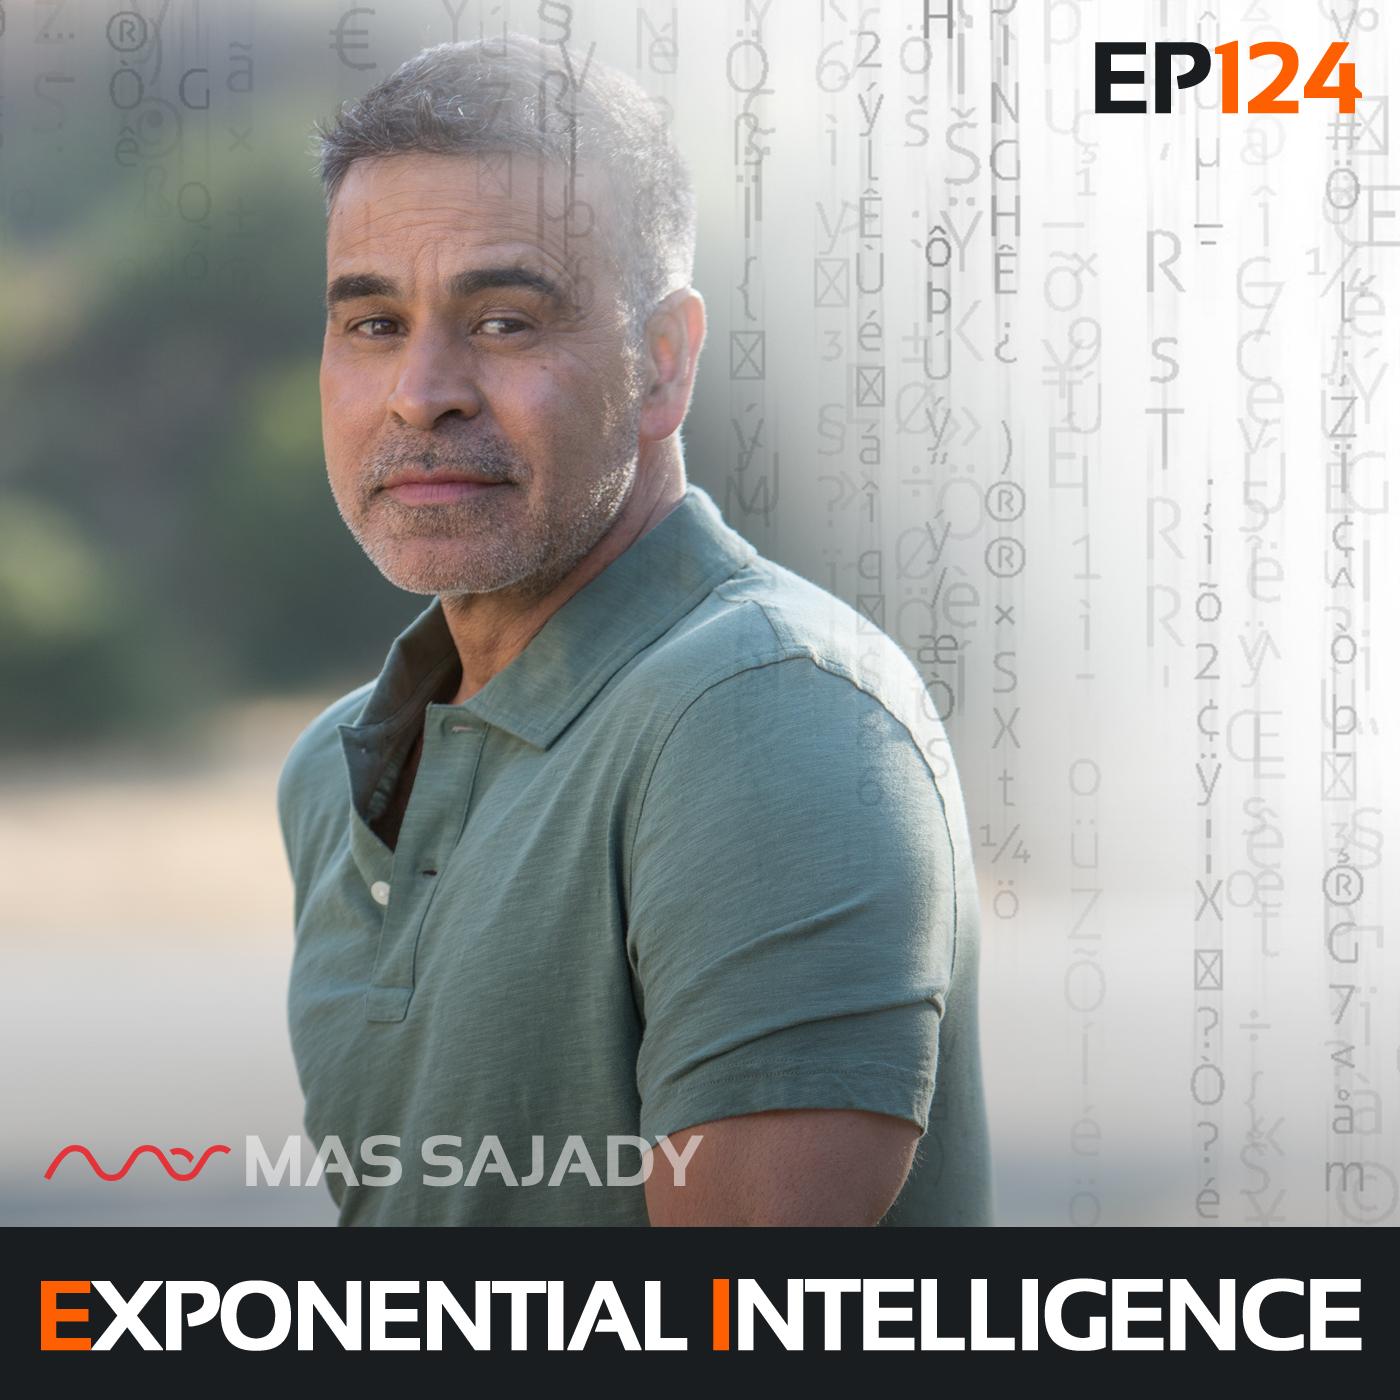 124 episode art - exponential intelligence.jpg